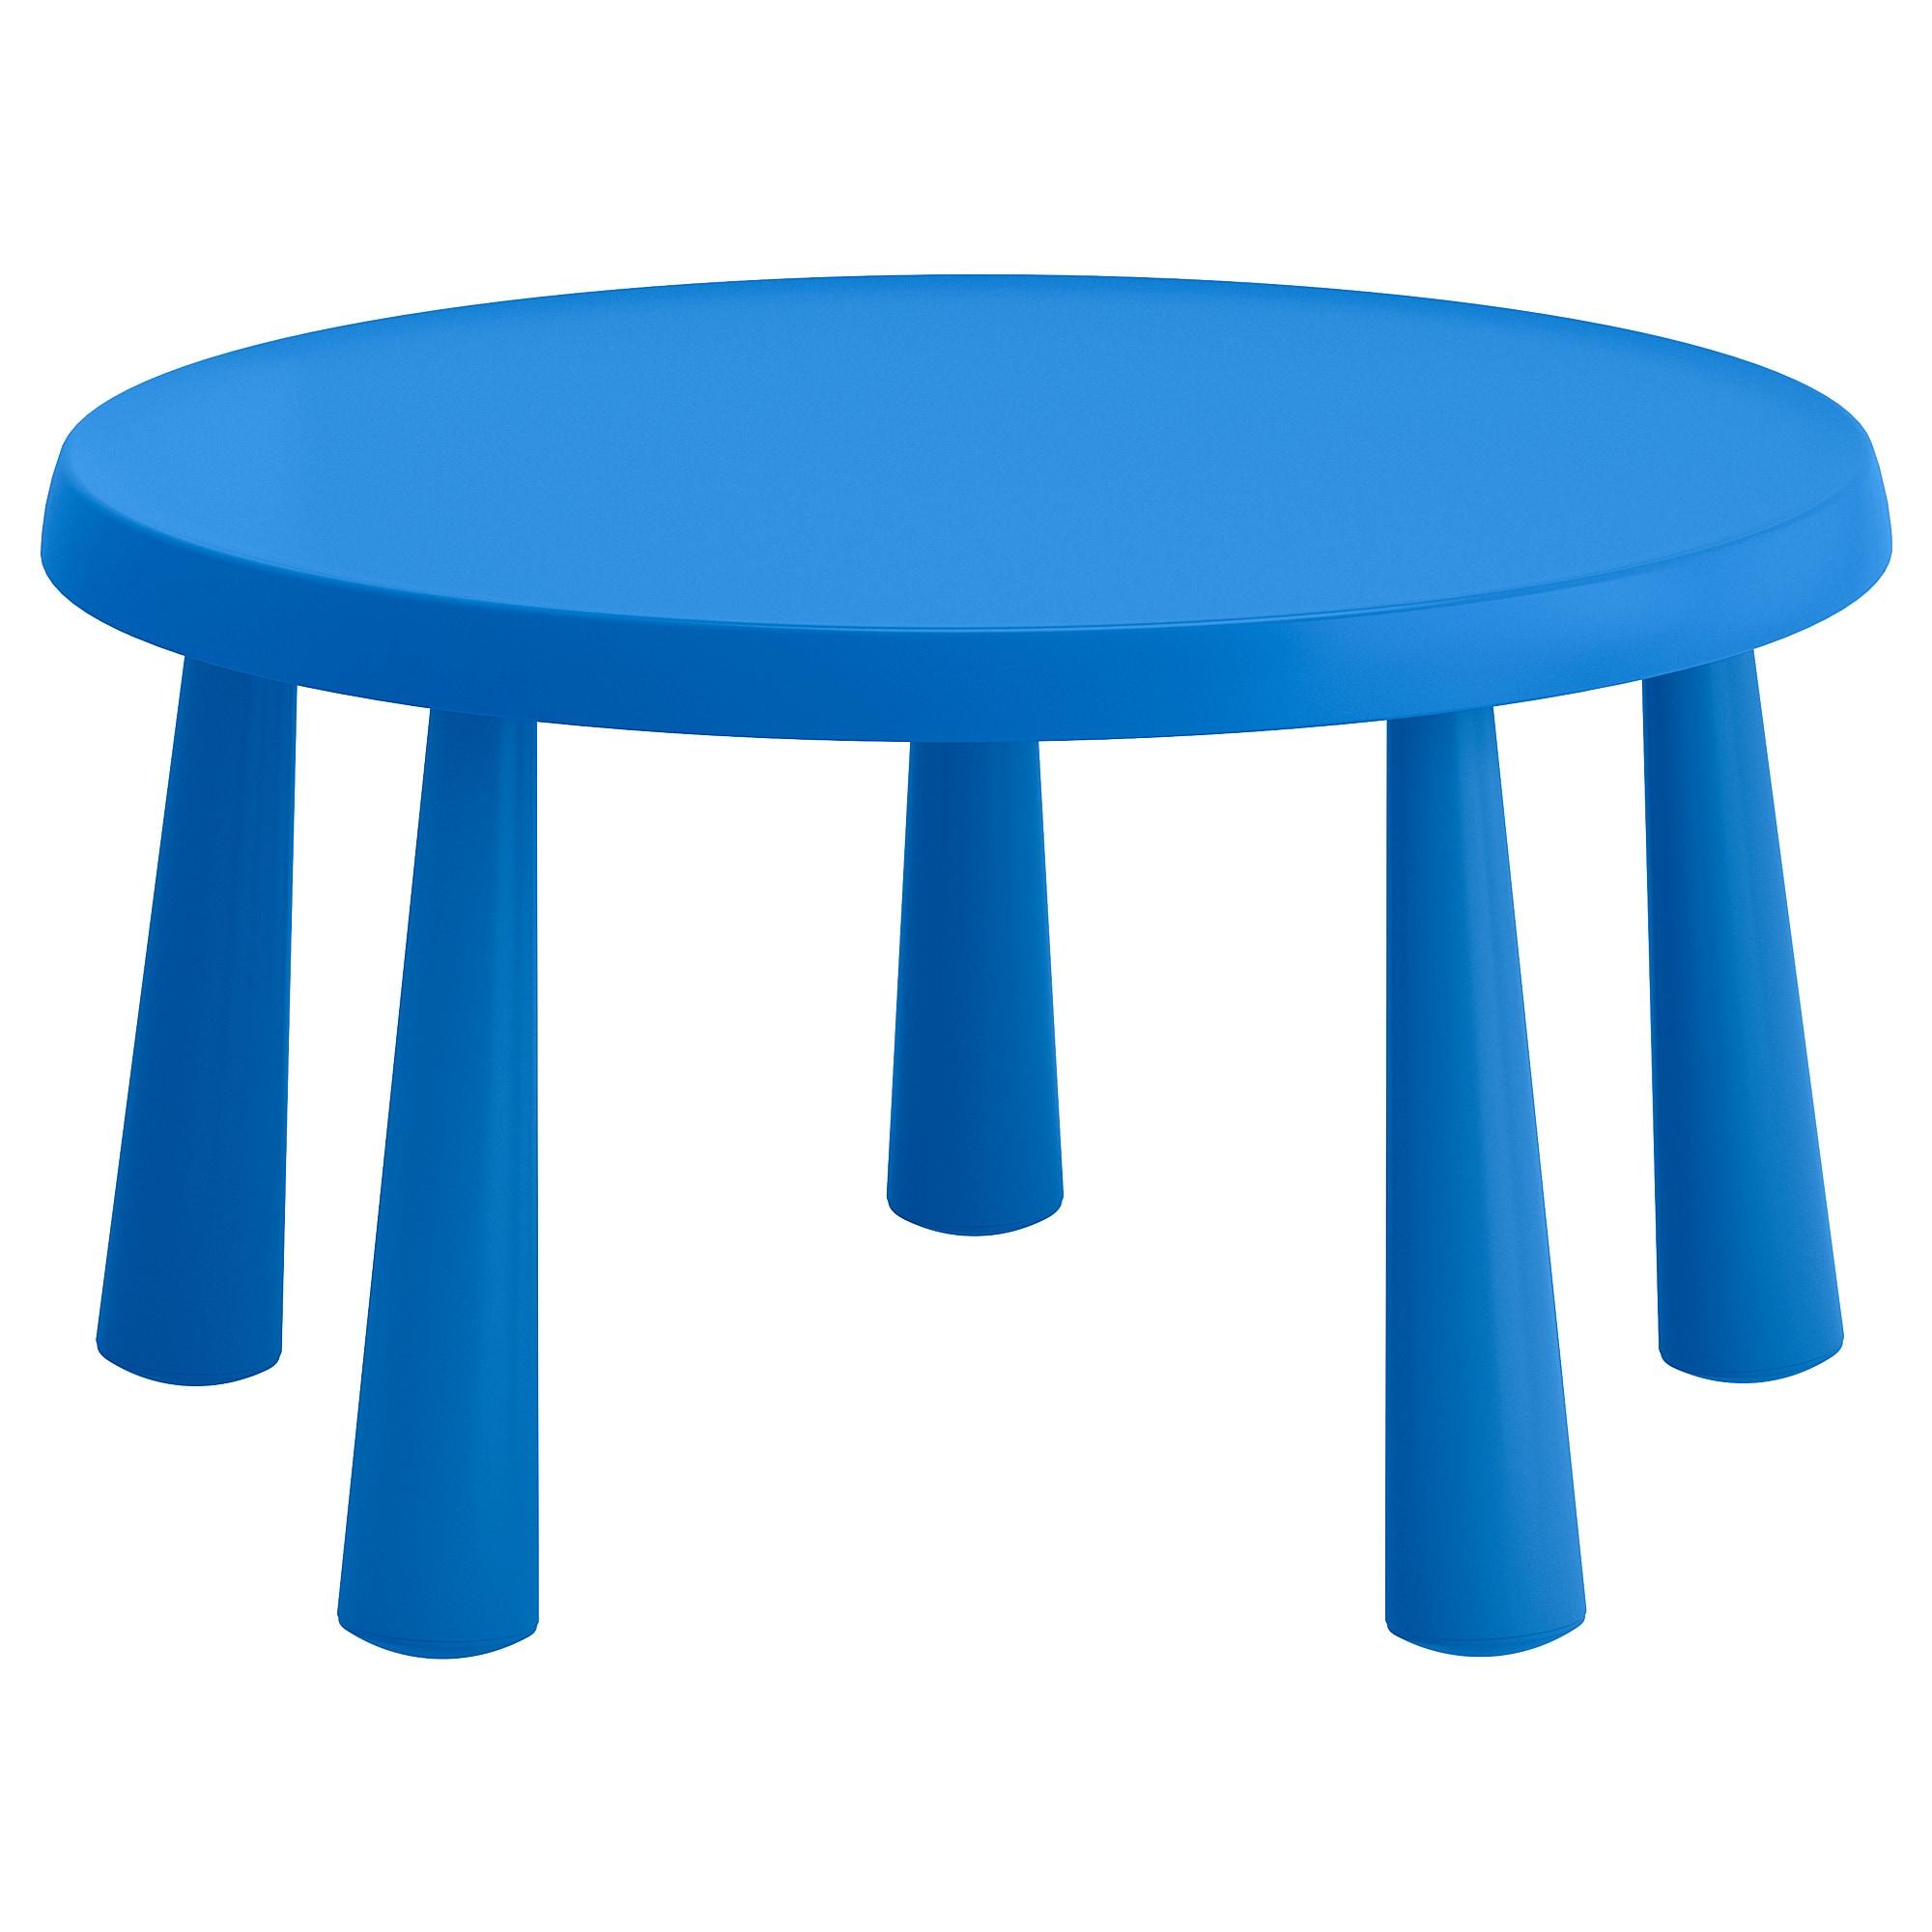 Ikea Sillas Niños 8ydm Mammut Mesa Para Nià Os Int Ext Azul 85 Cm Ikea